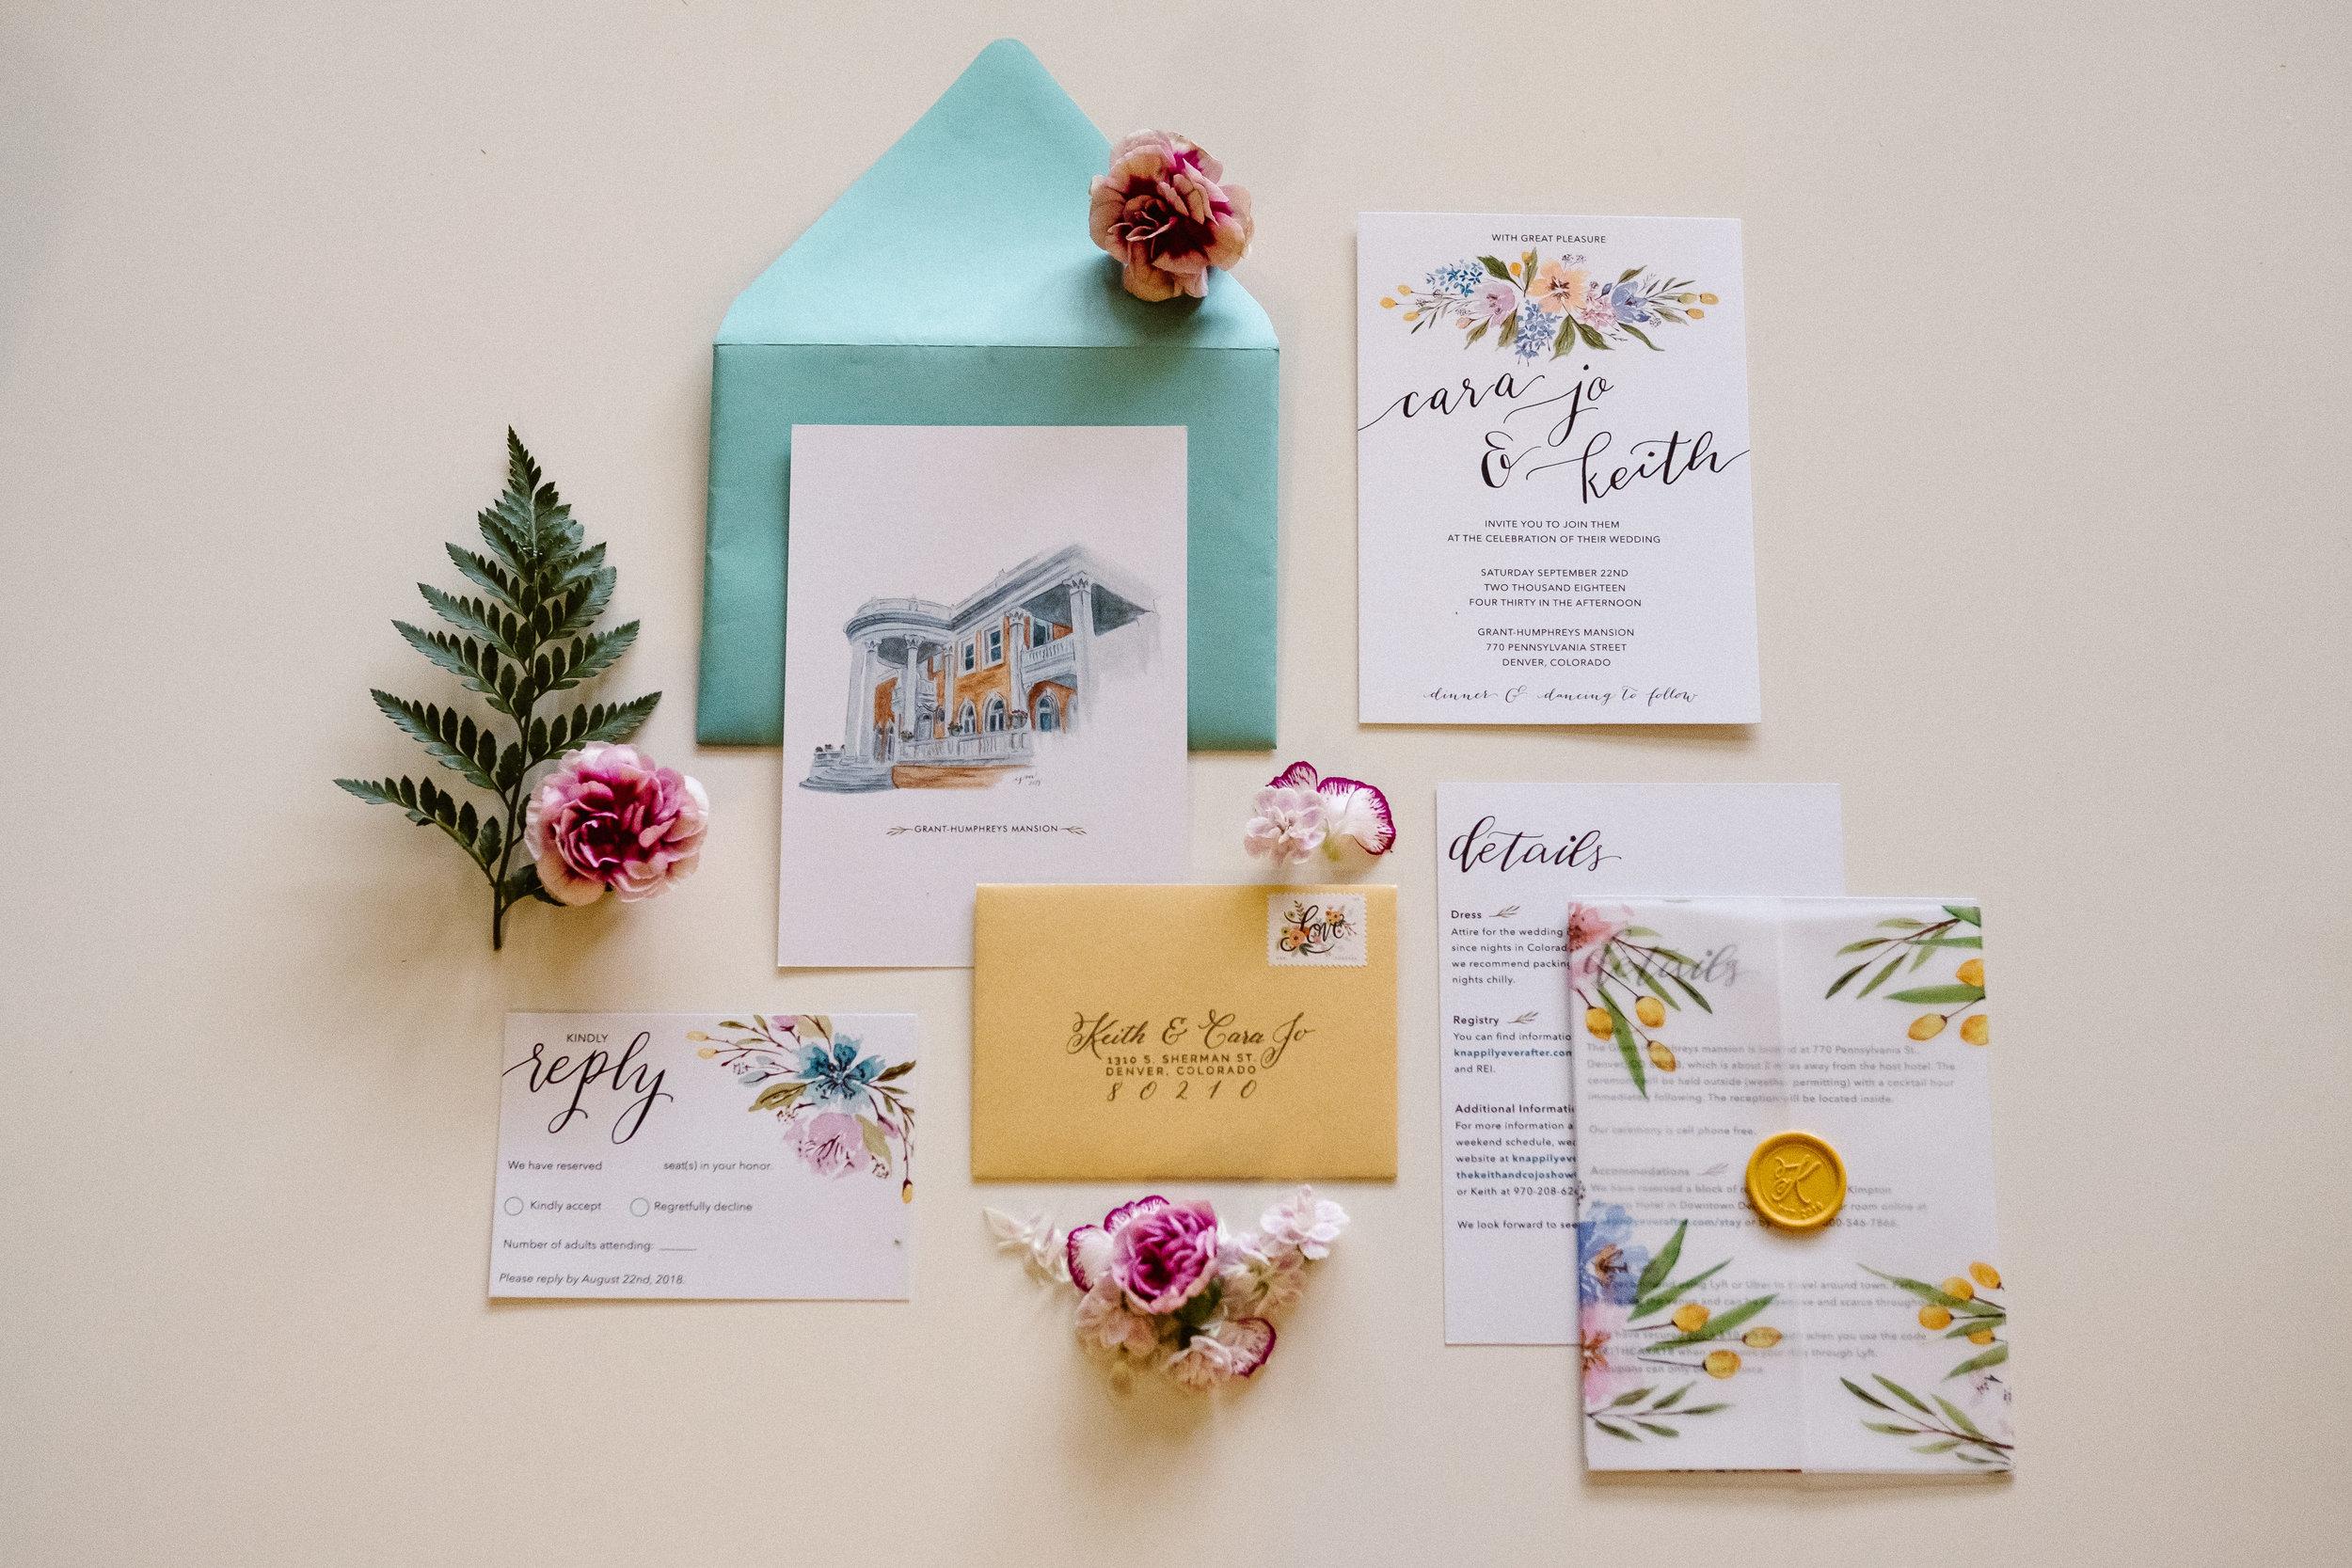 cara-jo-keith-grant-humphreys-mansion-wedding-7-81.jpg